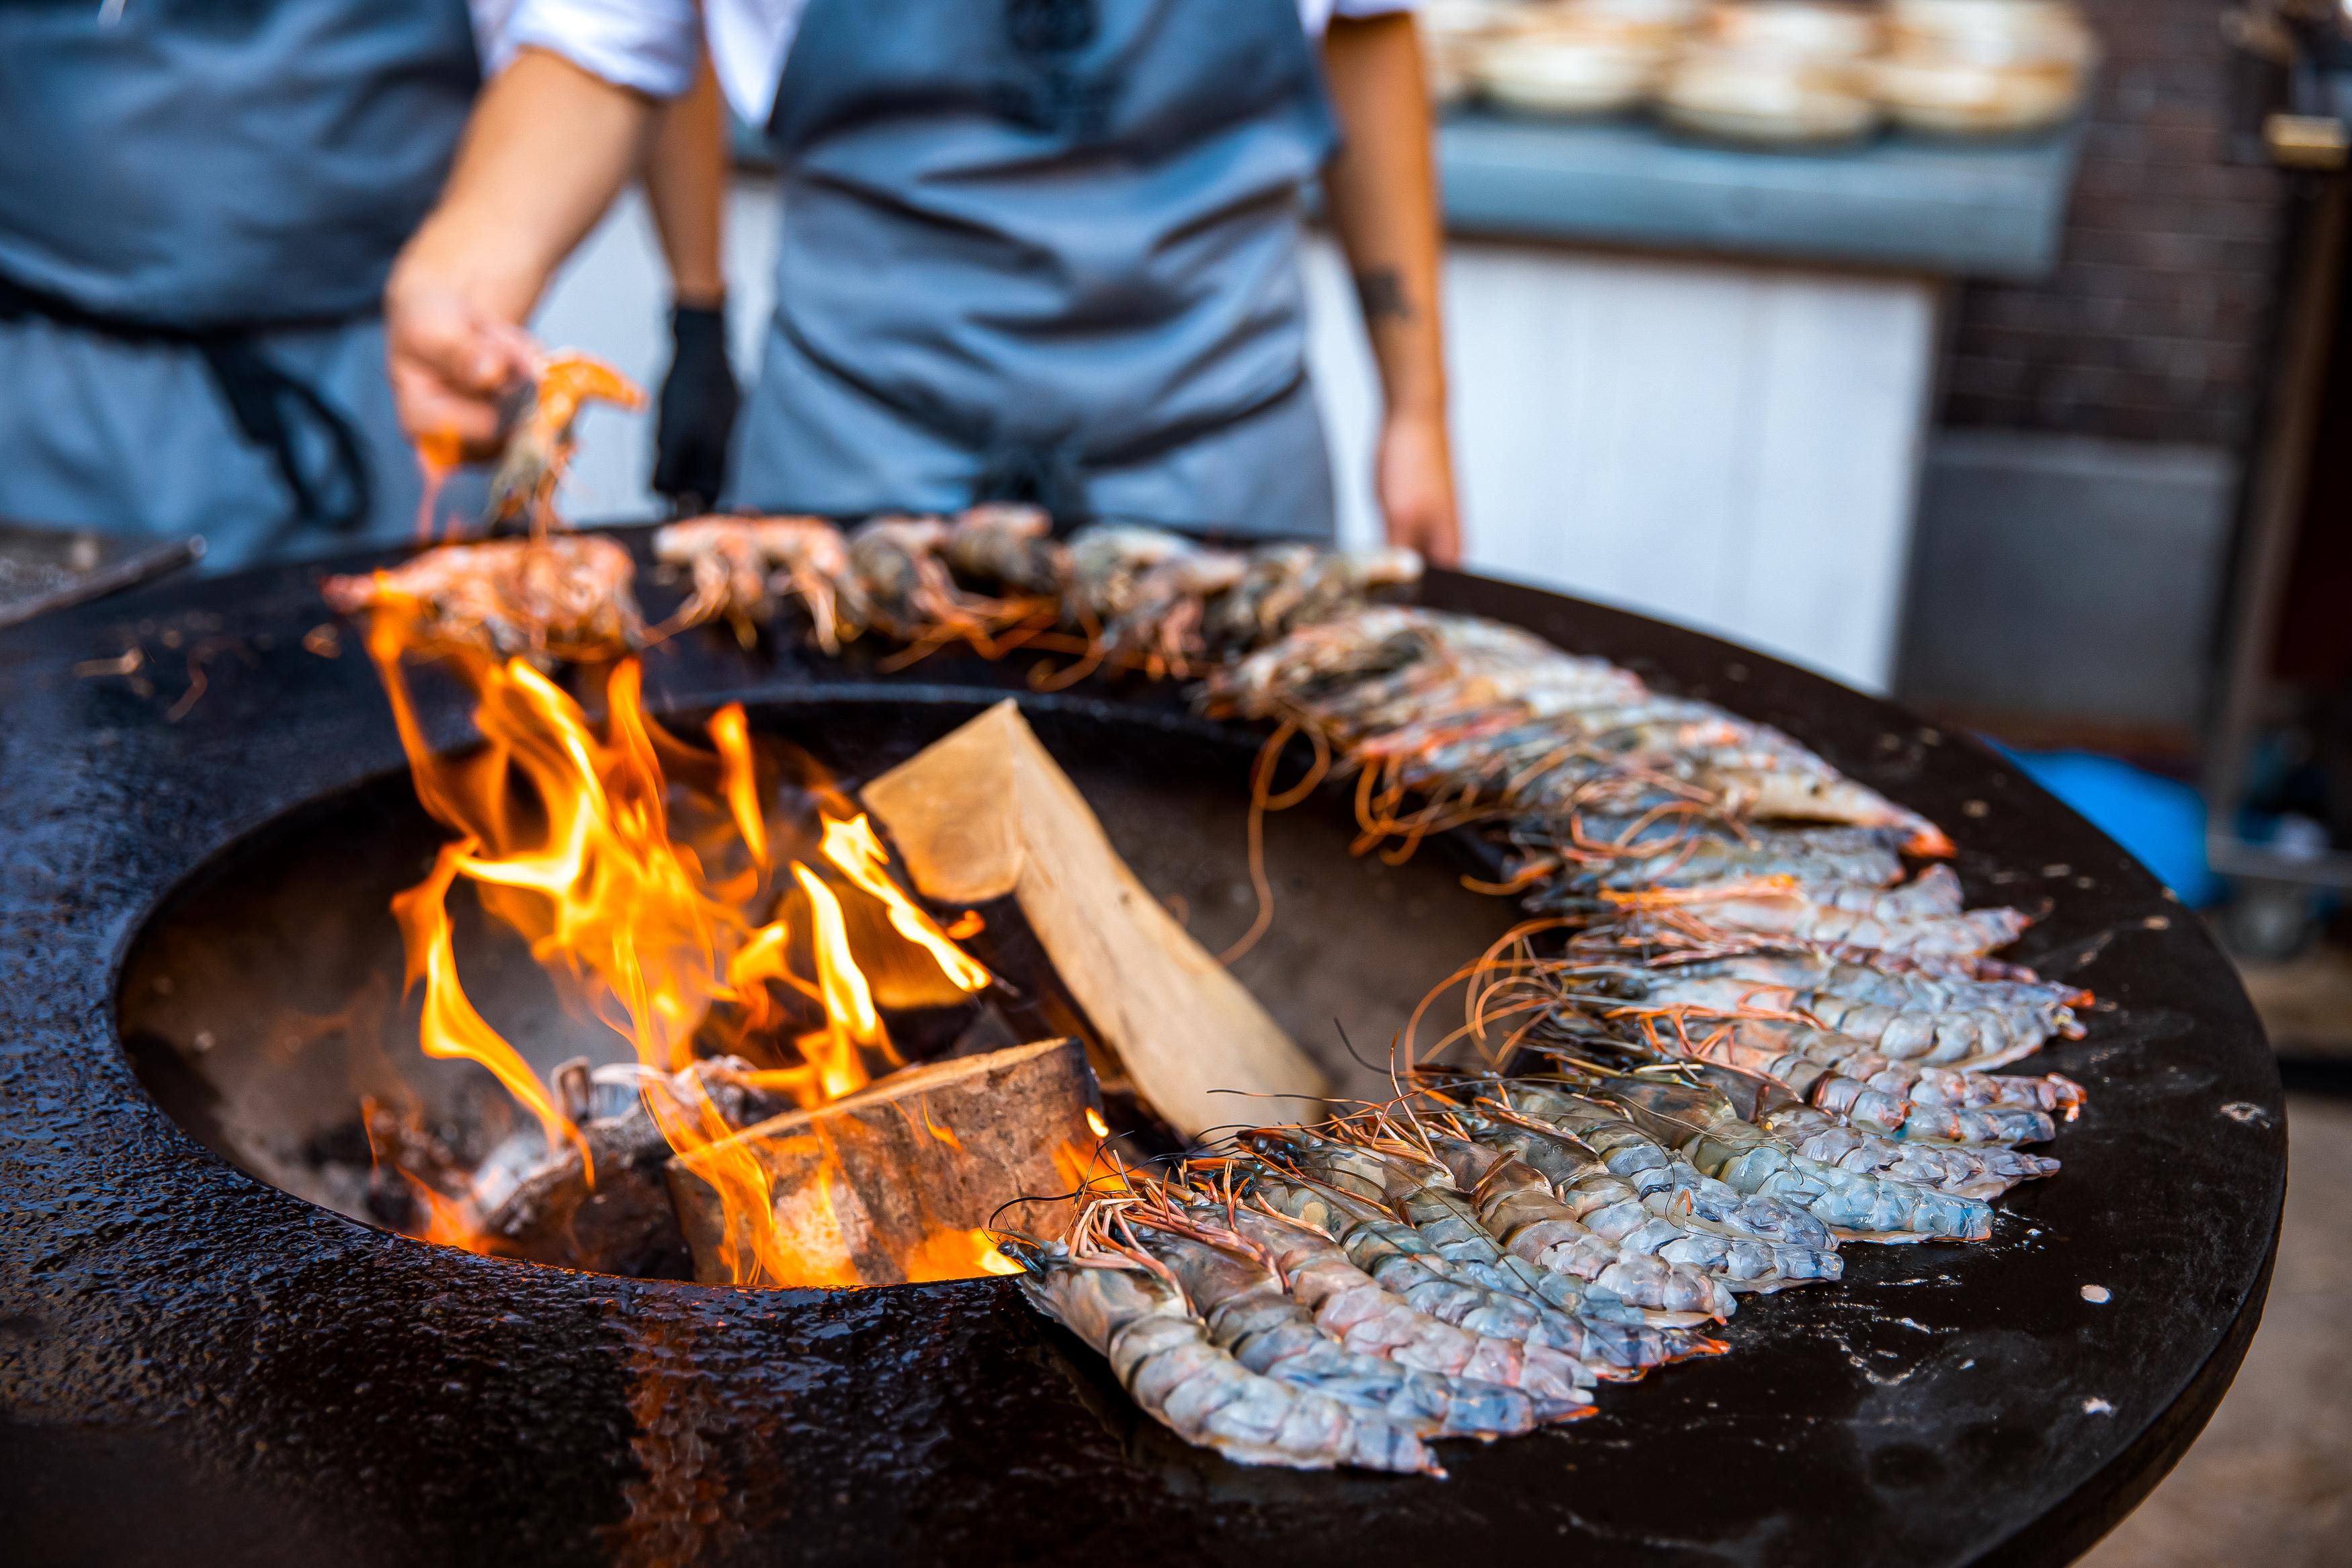 BRUGAL BBQ SUNDAYS